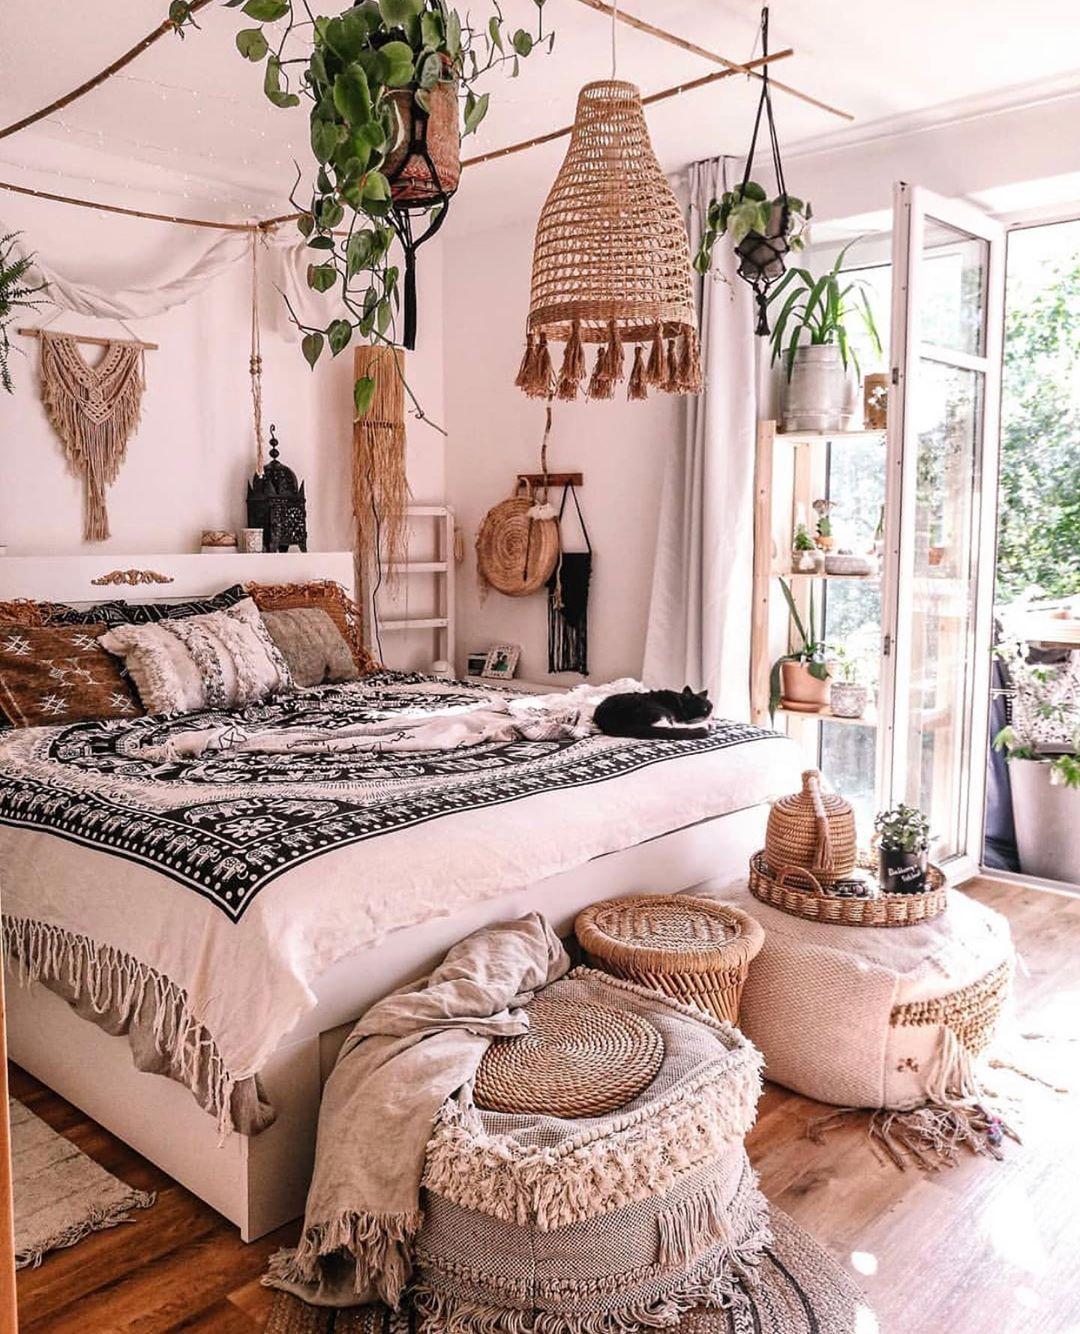 Loving This Boho Room By Kalk Katt What Do You Think